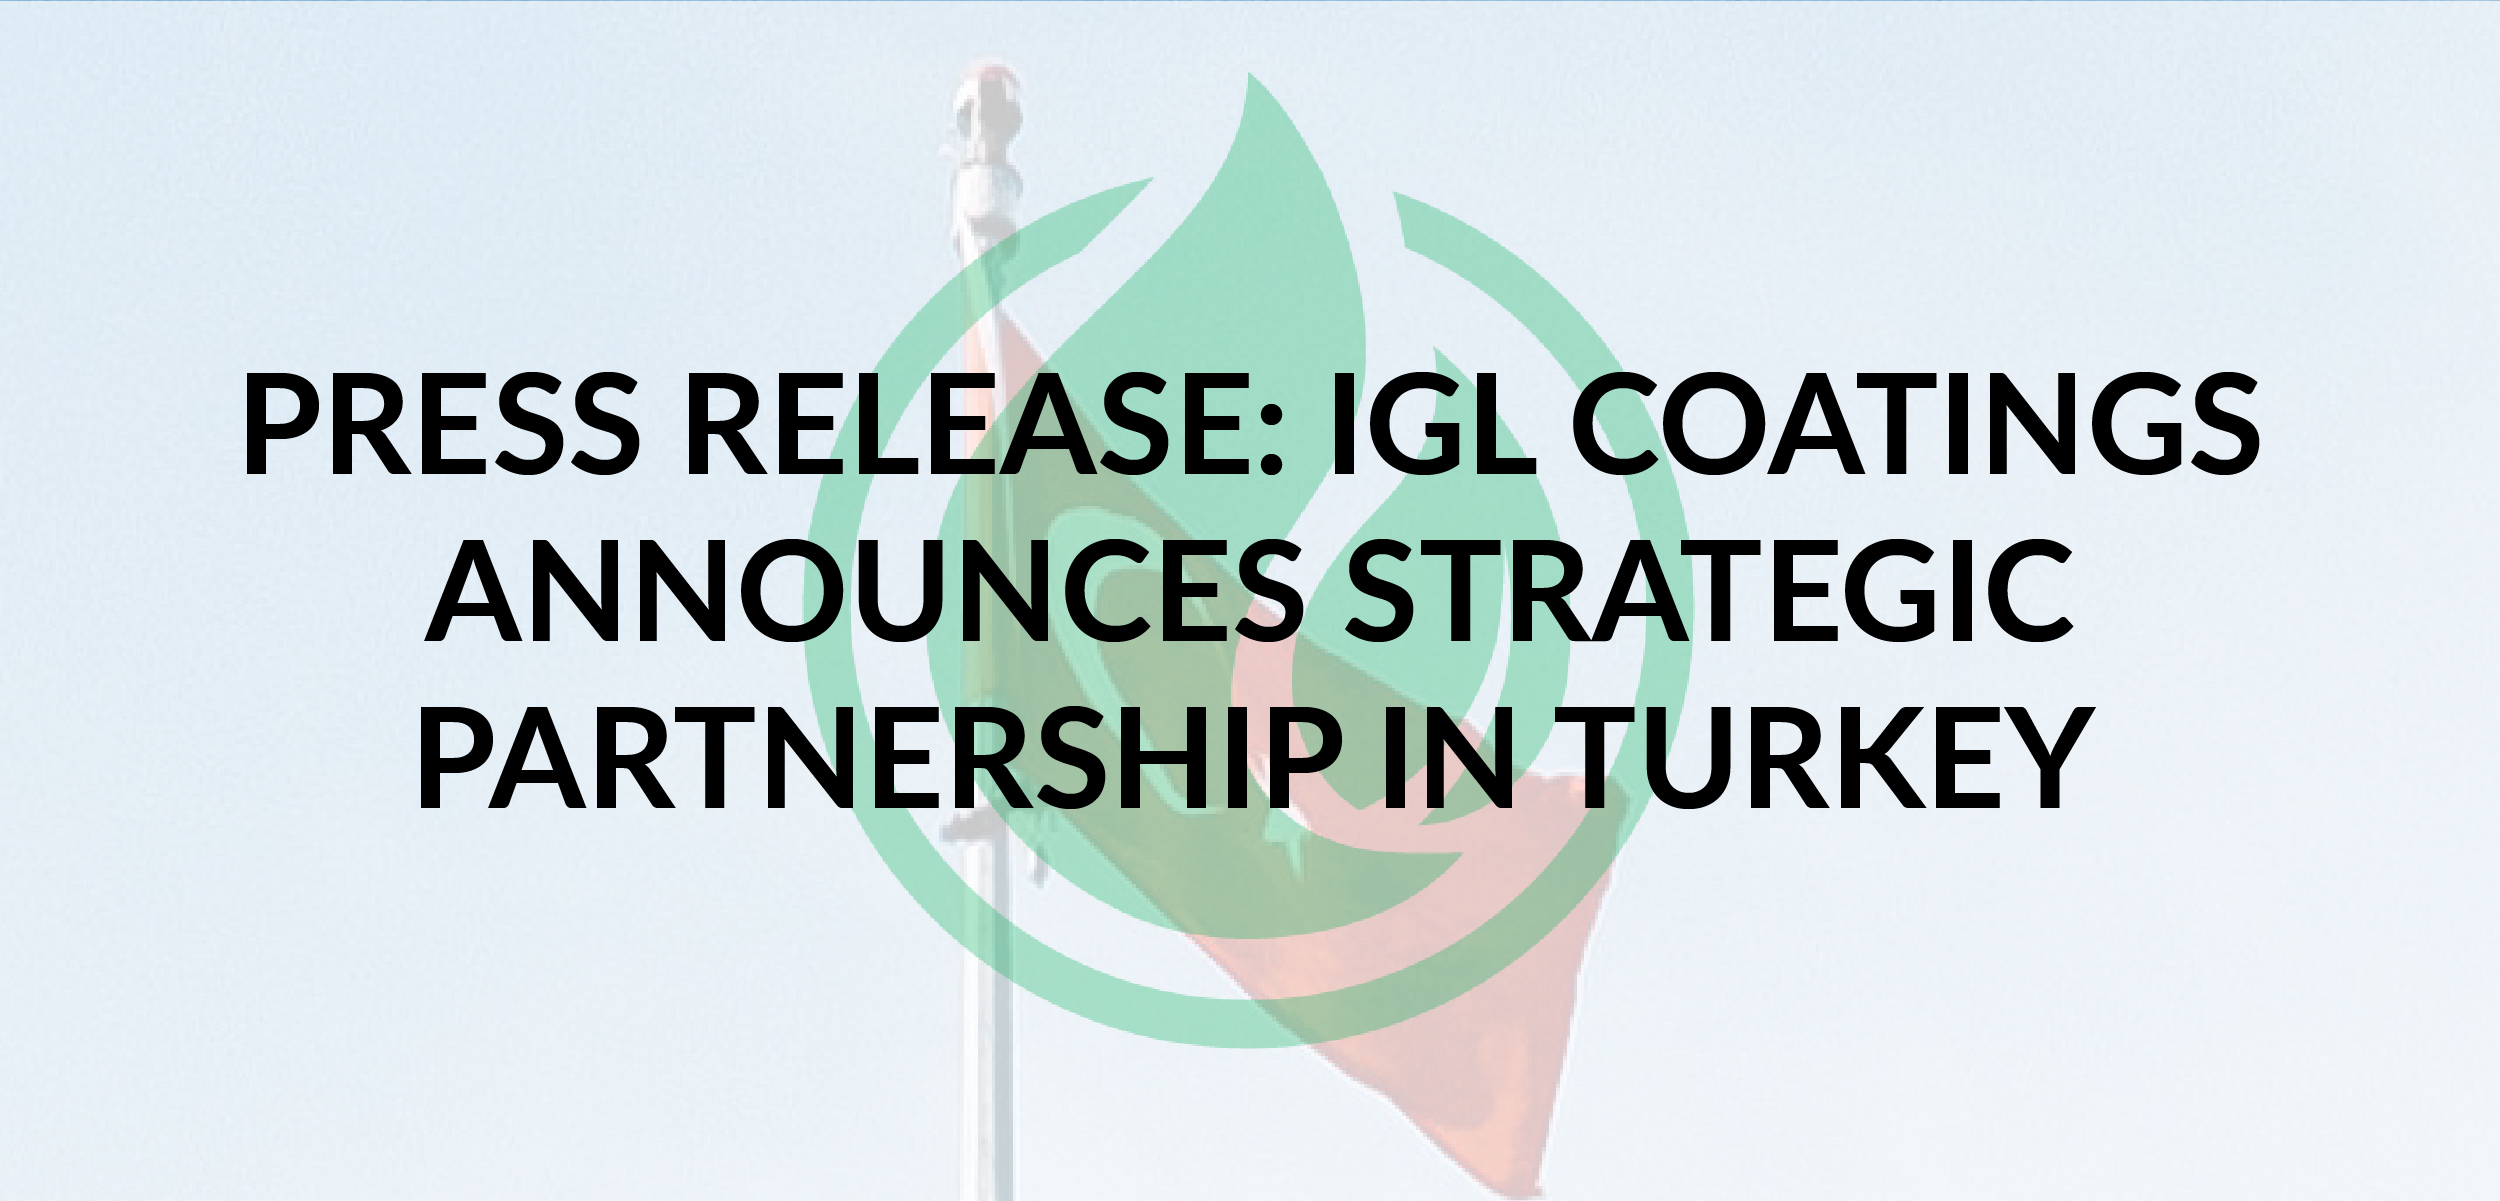 Press Release: IGL Coatings Announces Strategic Partnership in Turkey